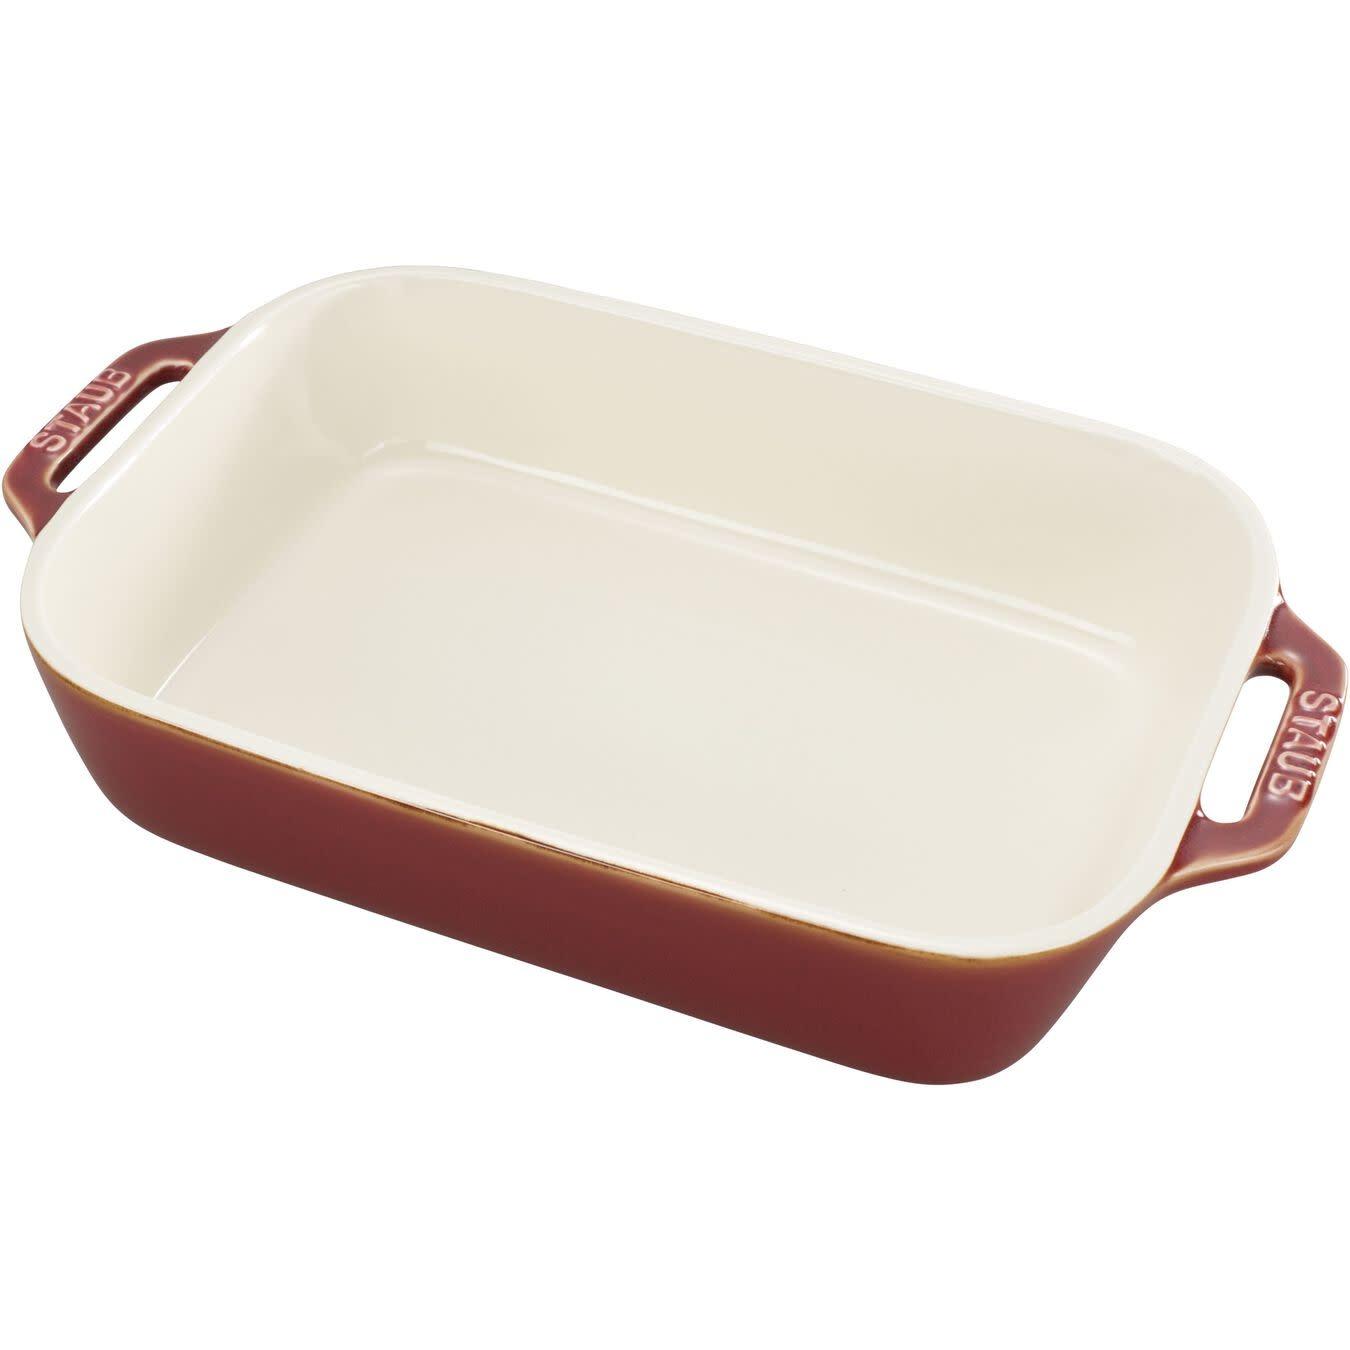 "Staub Rectangular Baking Dish Rustic Red 27x20cm/10.5""x7.5"""